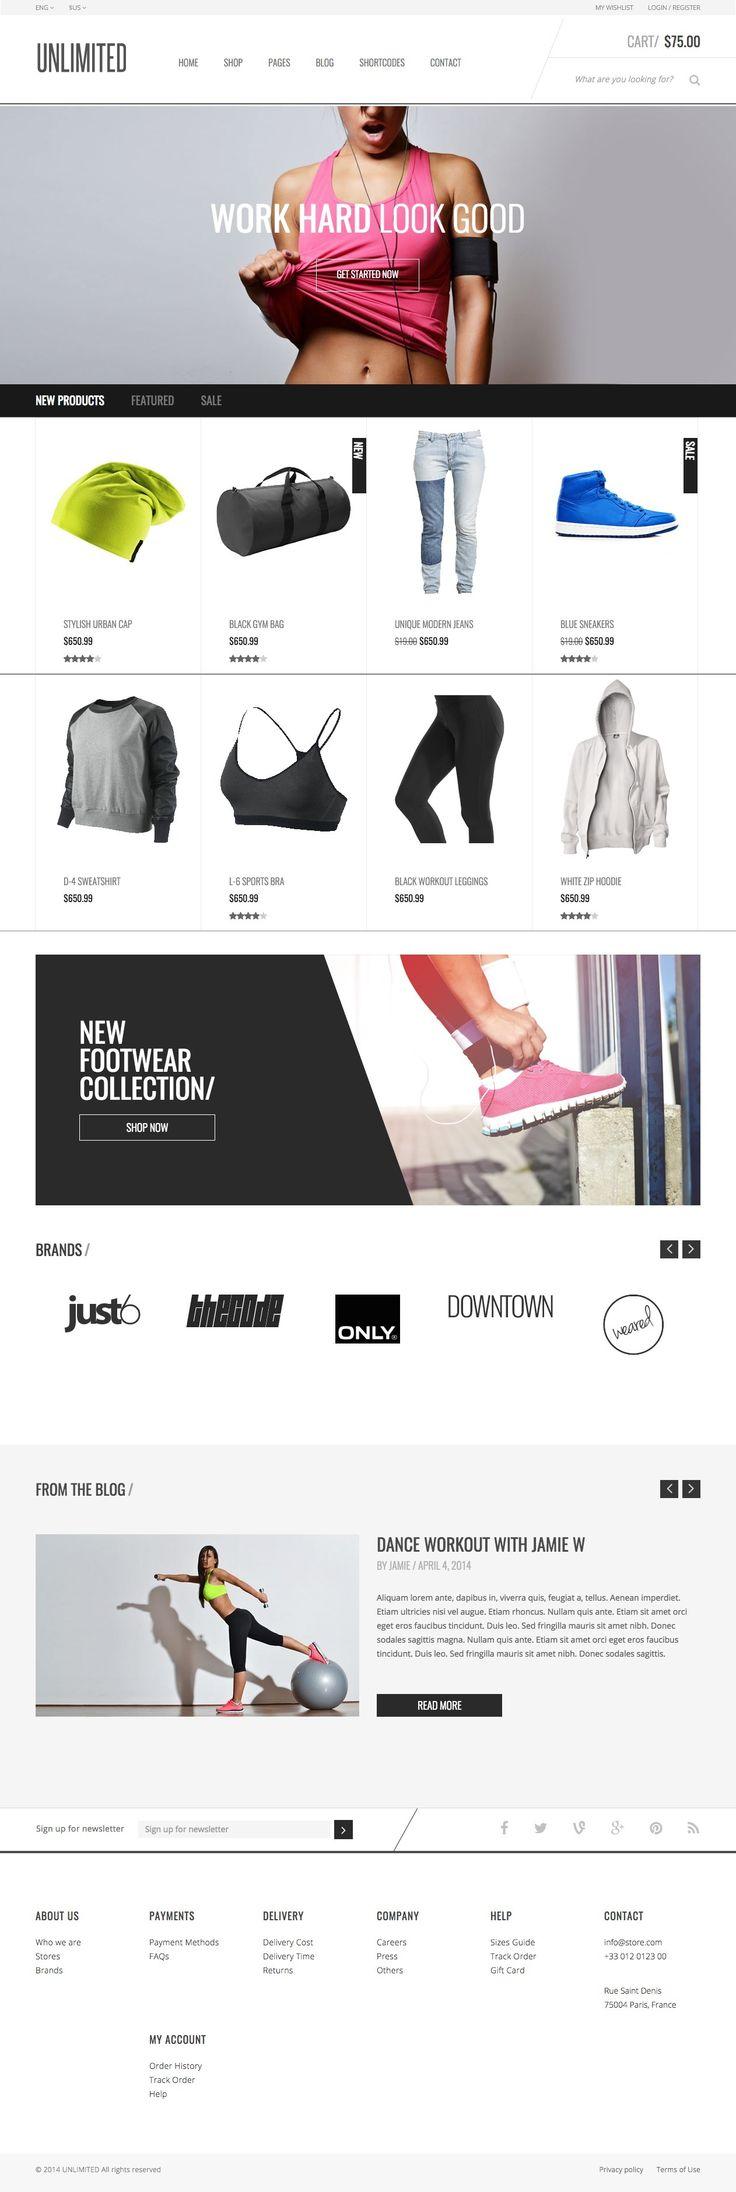 Unlimited Sports Wear & Accessories Store Template #sports wear store #$17